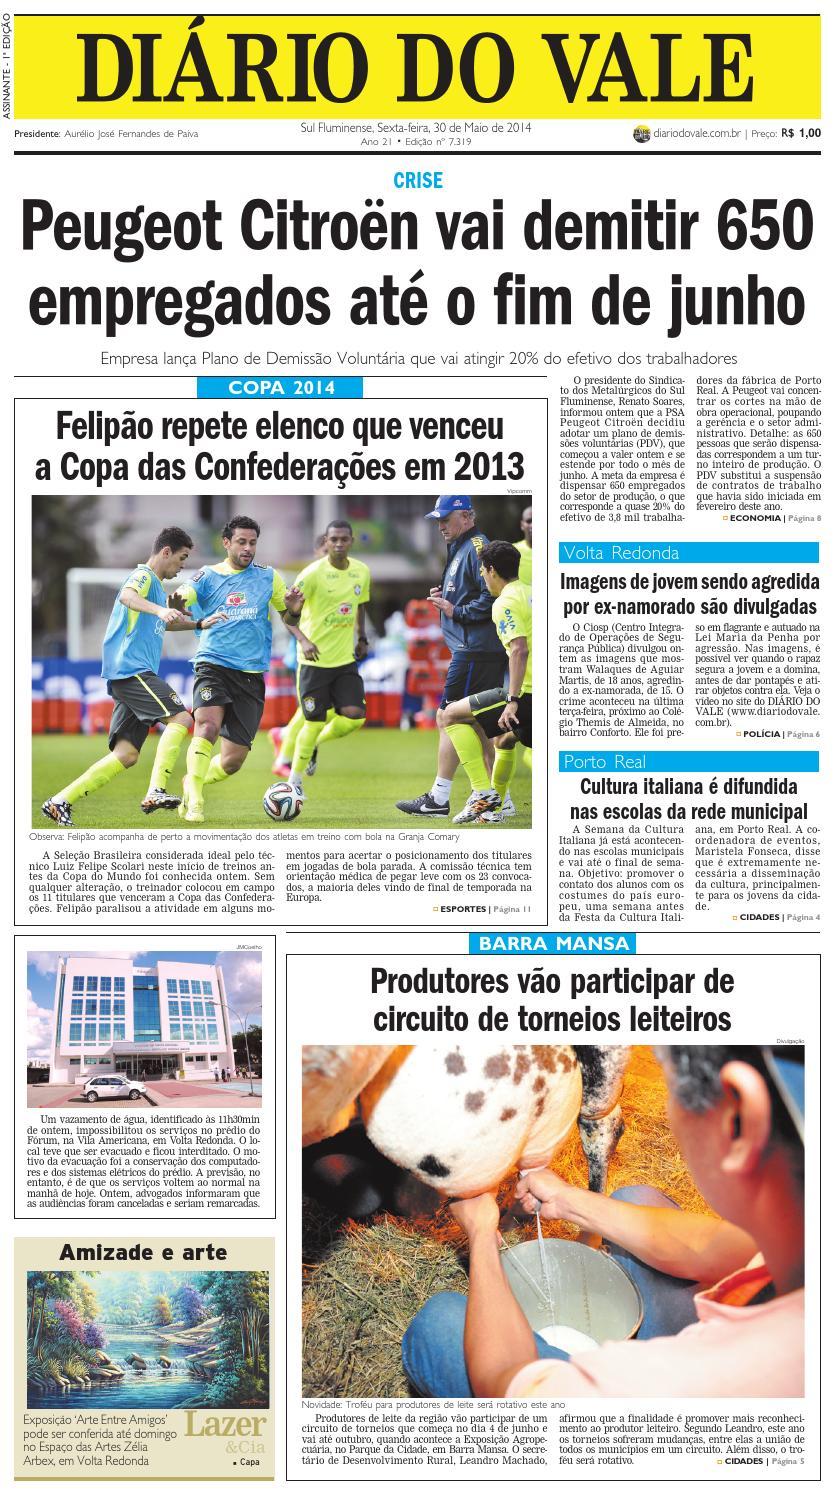 7319 diario sexta feira 30 05 2014 by Diário do Vale - issuu 495fdb254eb53